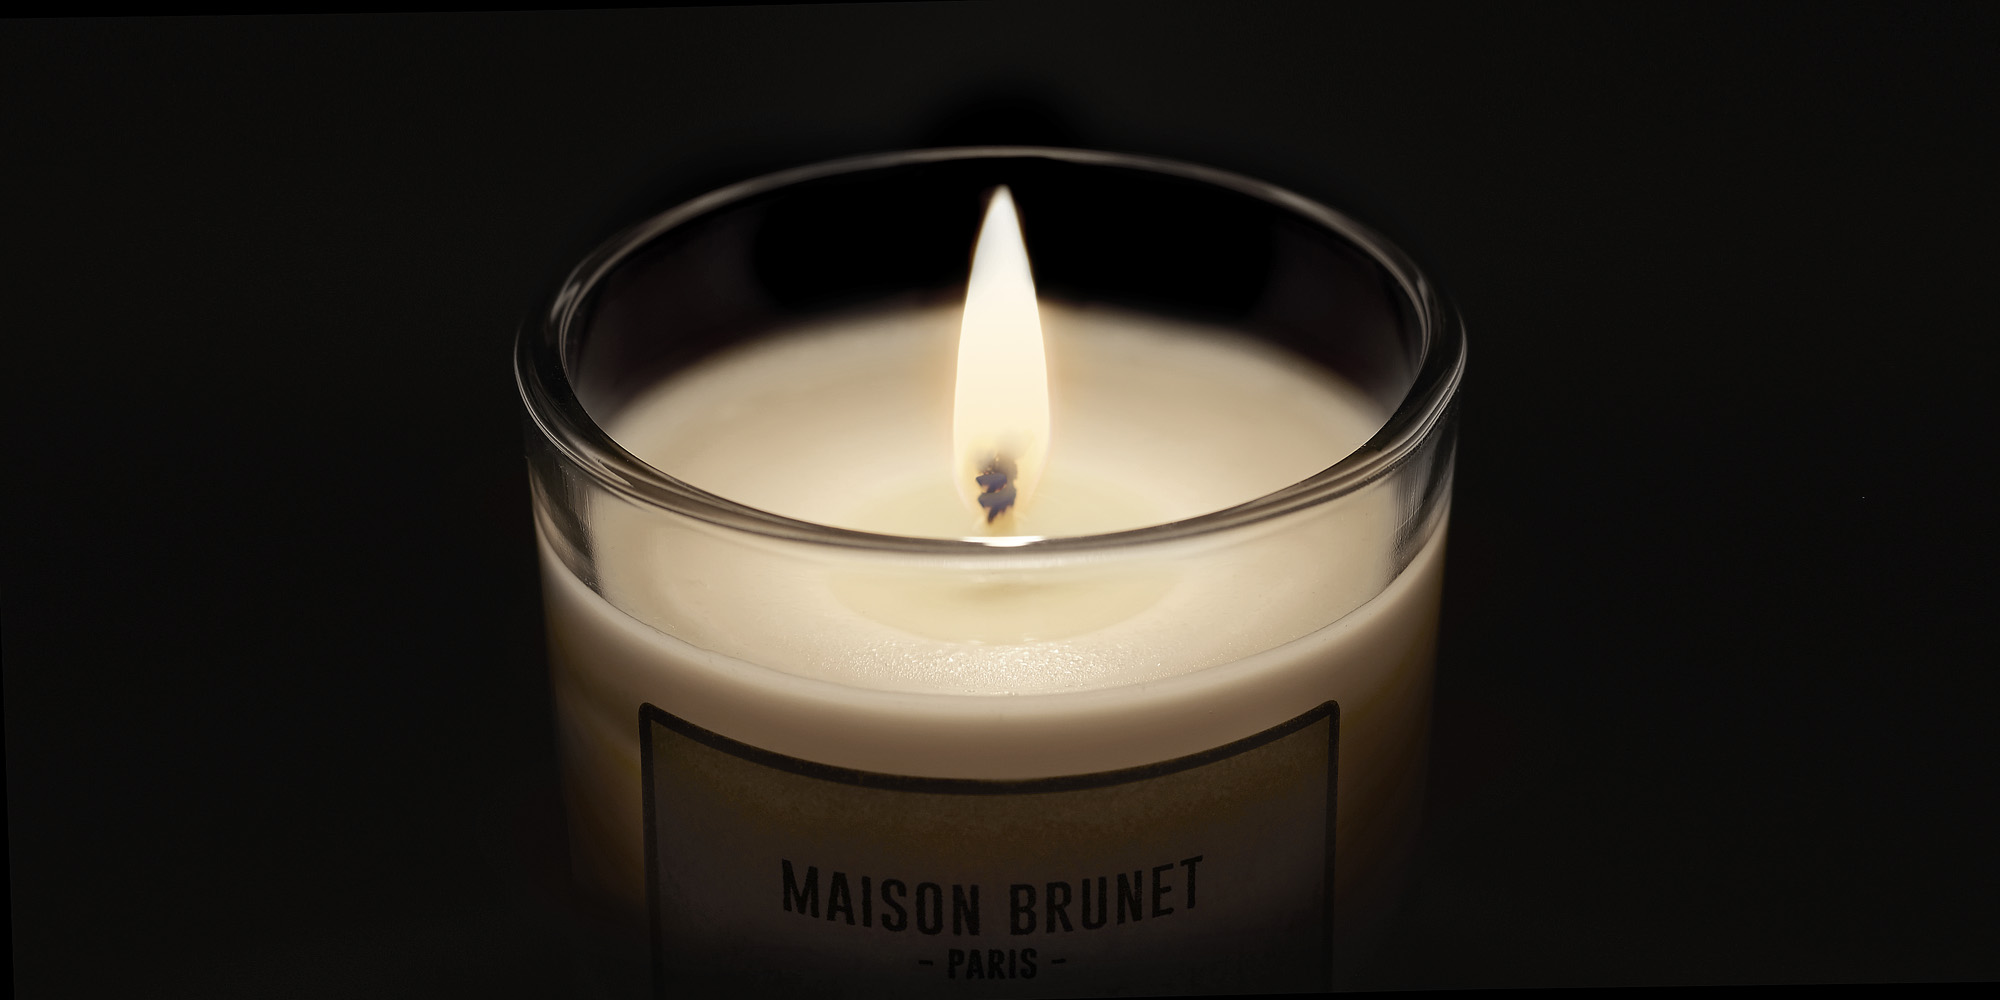 Maison Brunet Bougie